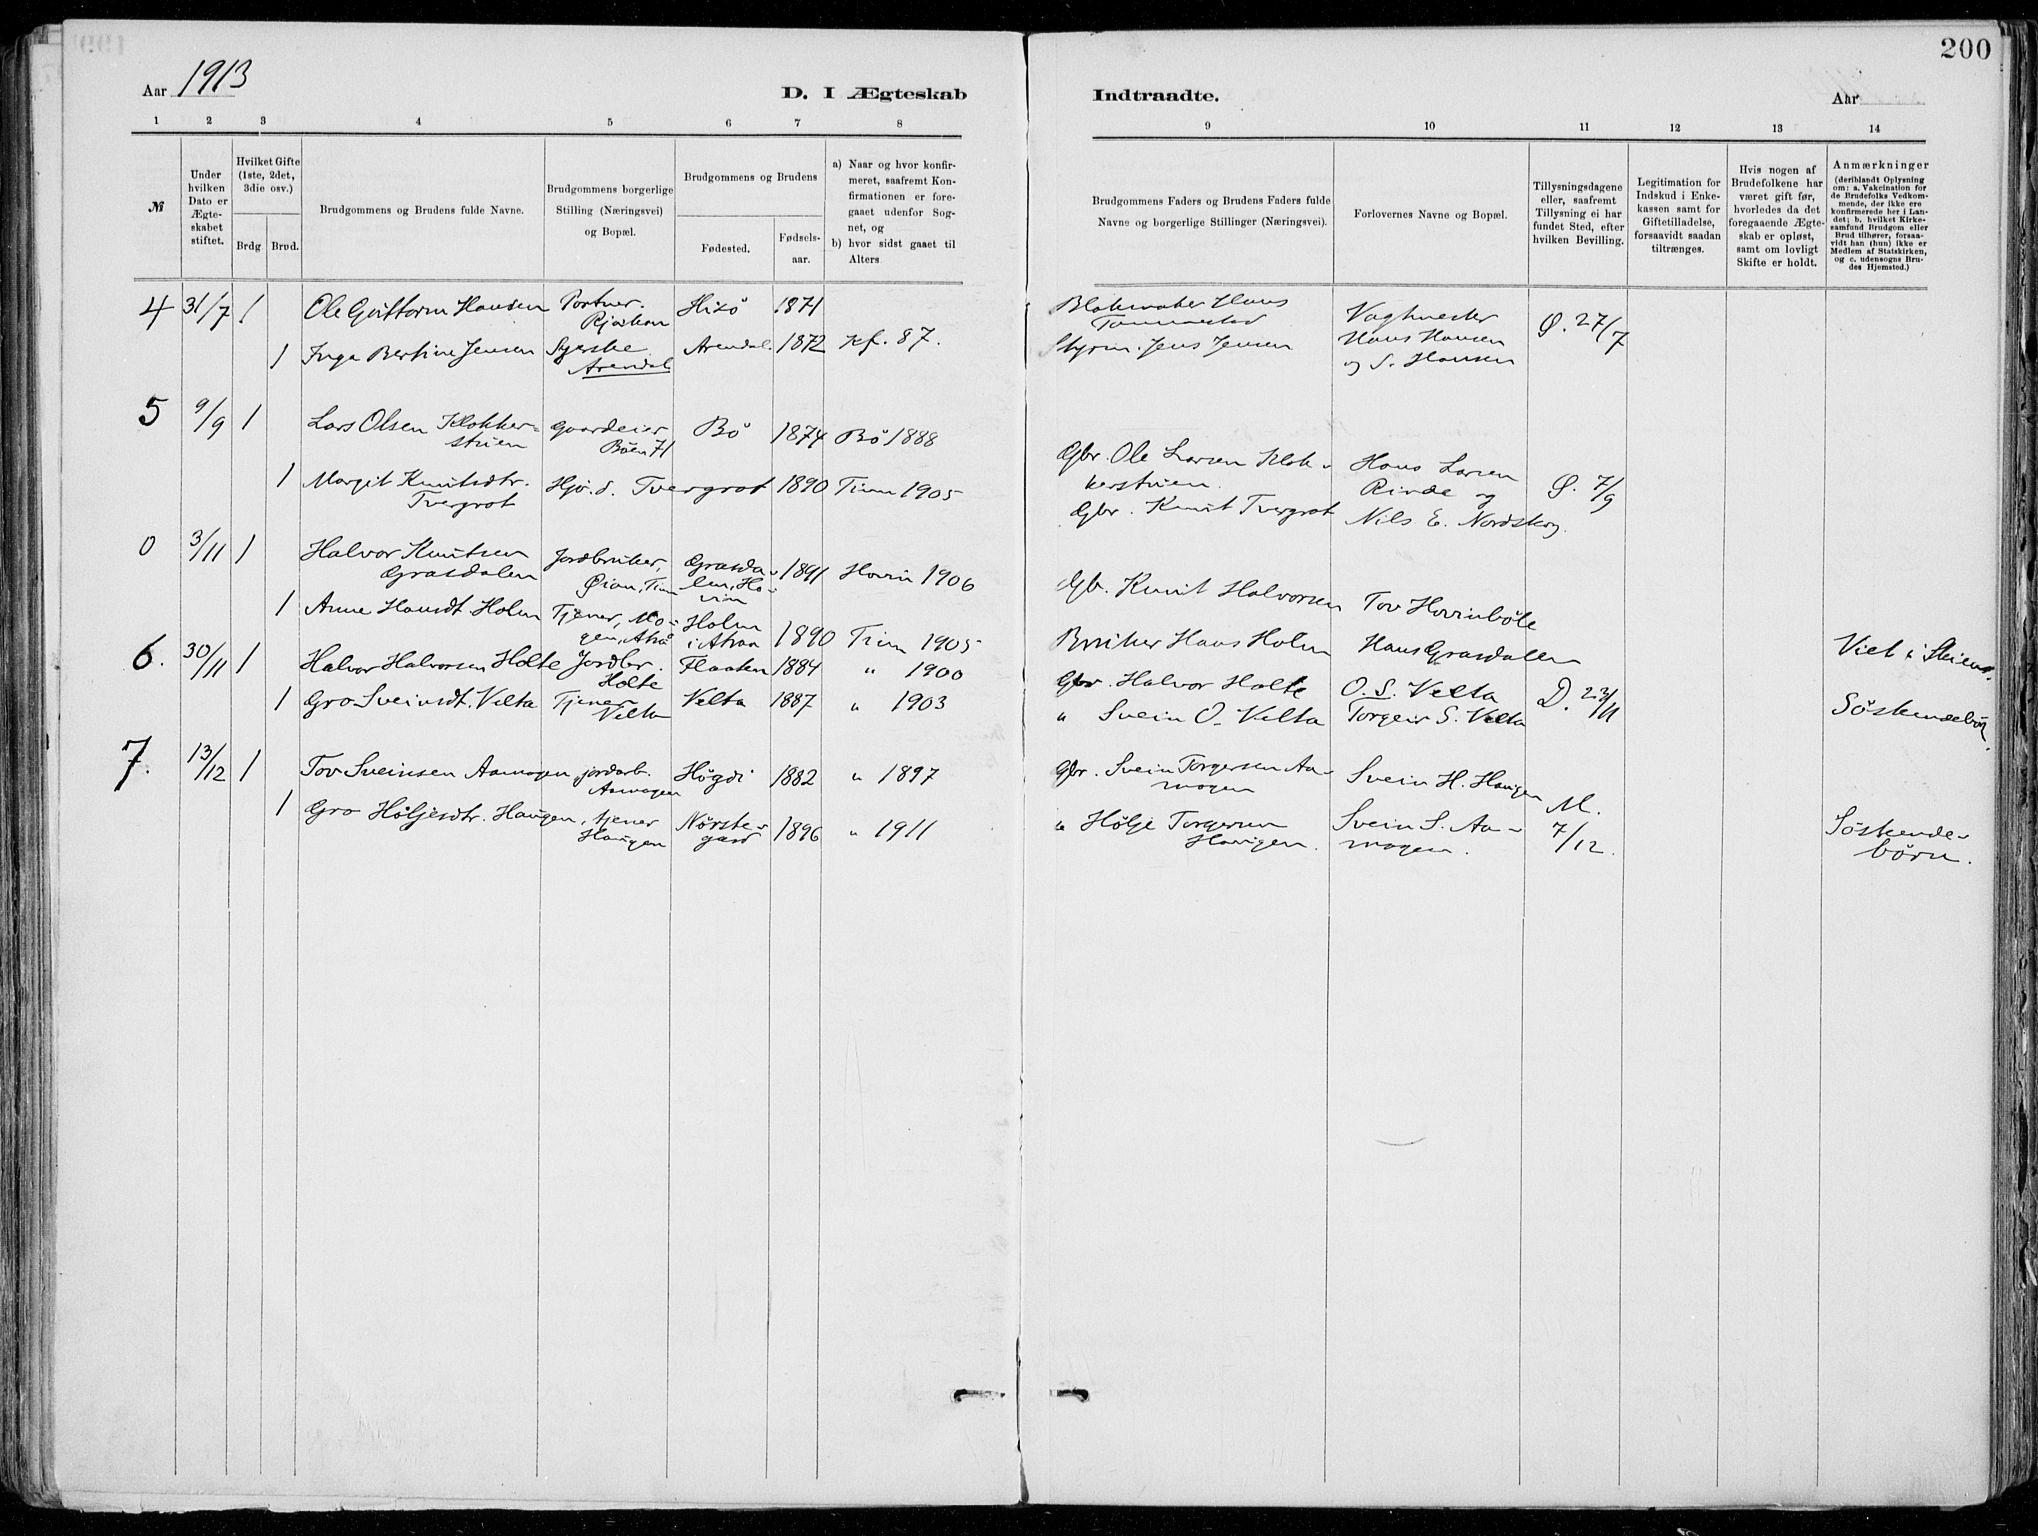 SAKO, Tinn kirkebøker, F/Fa/L0007: Ministerialbok nr. I 7, 1878-1922, s. 200